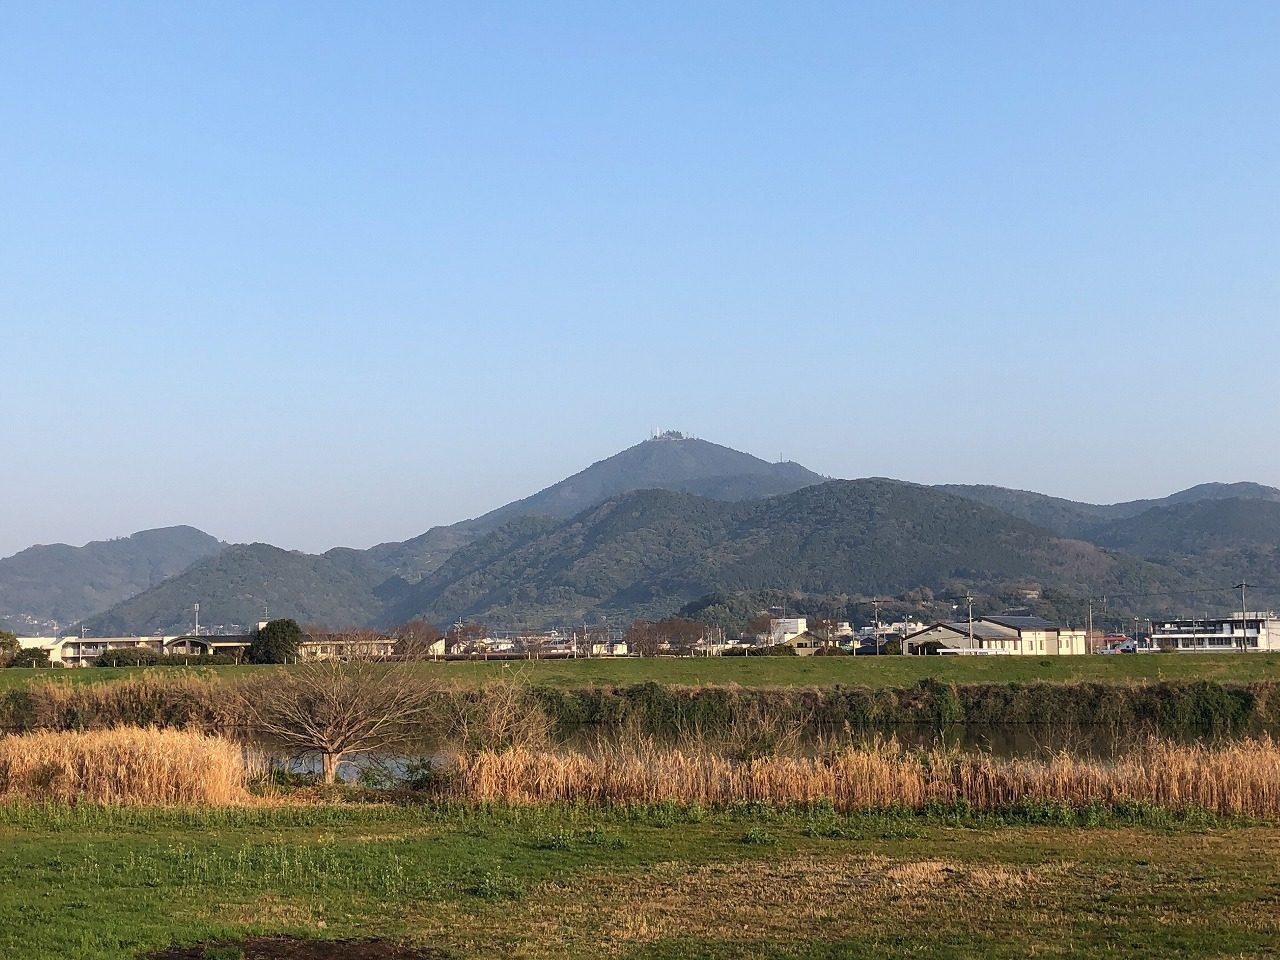 2019.3.8今朝の金峰山